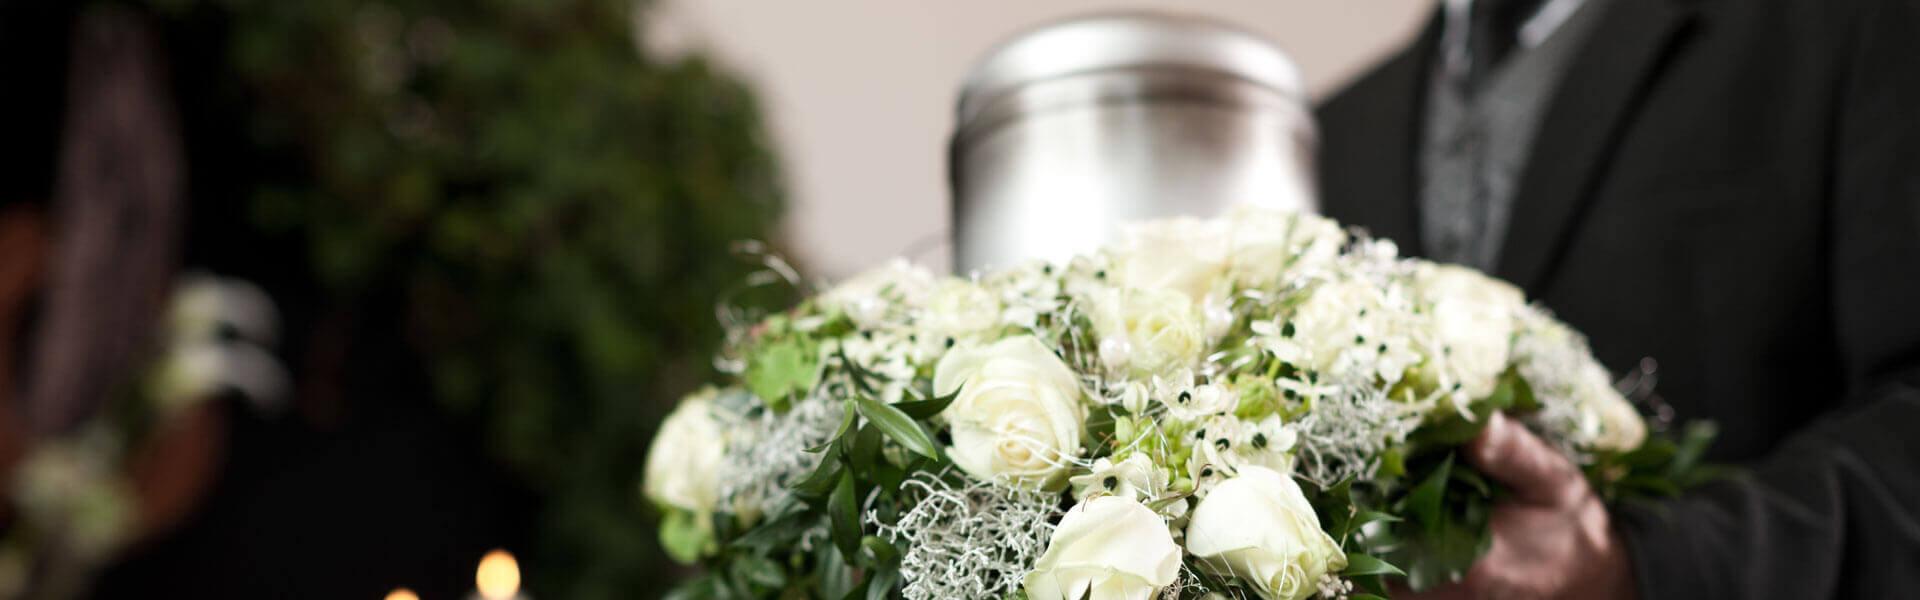 Gold Coast Crematorium Environmentally Friendly